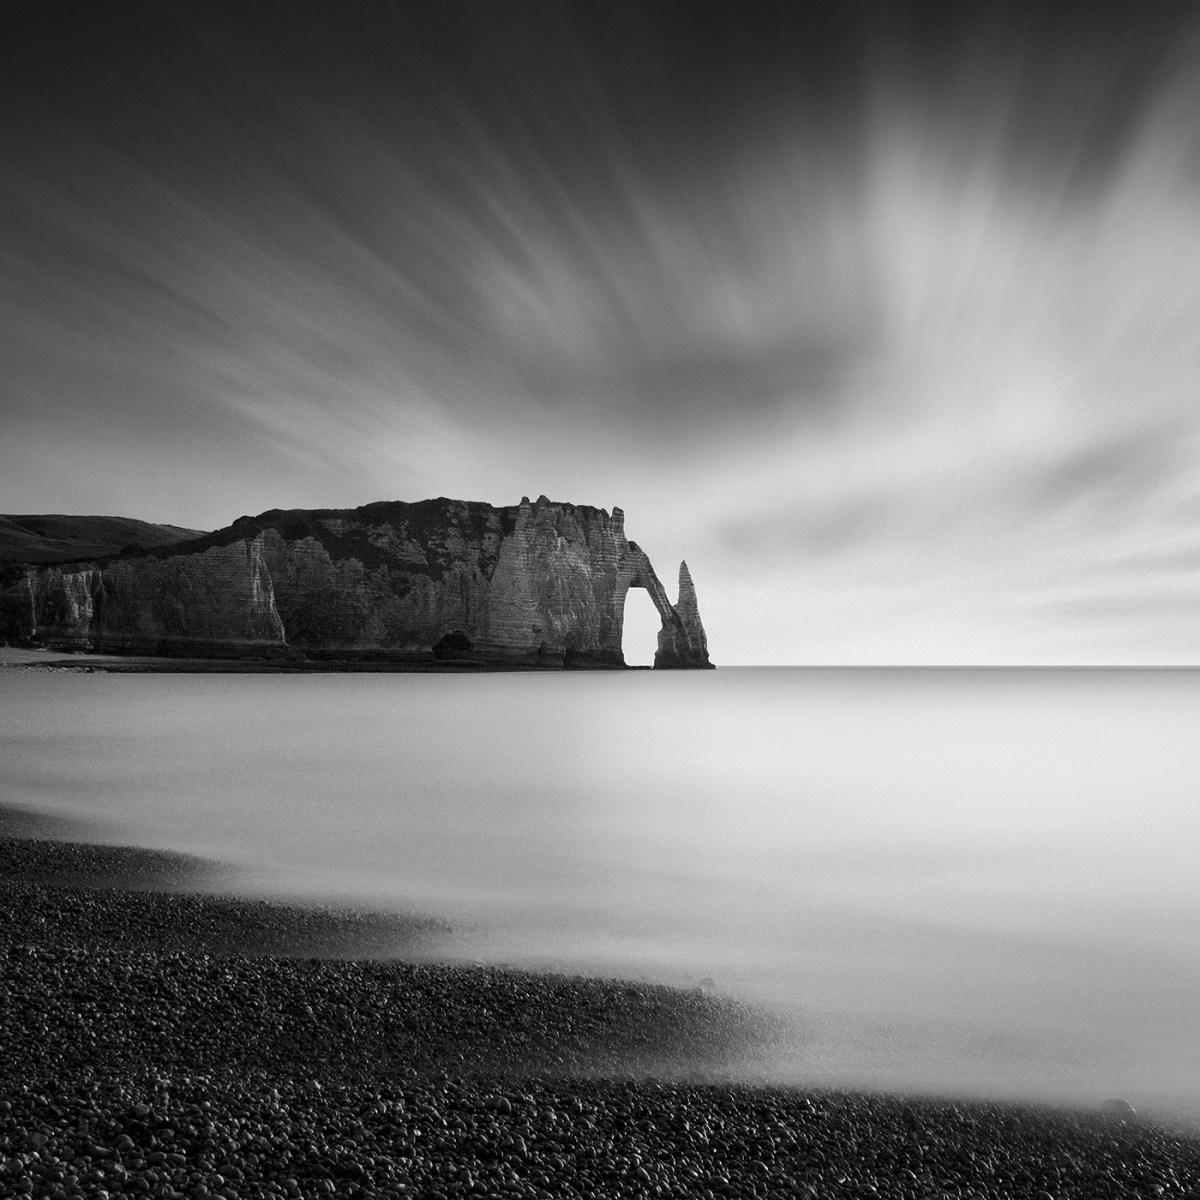 Arnaud-Bathiard-eternity-moss-and-fog-11